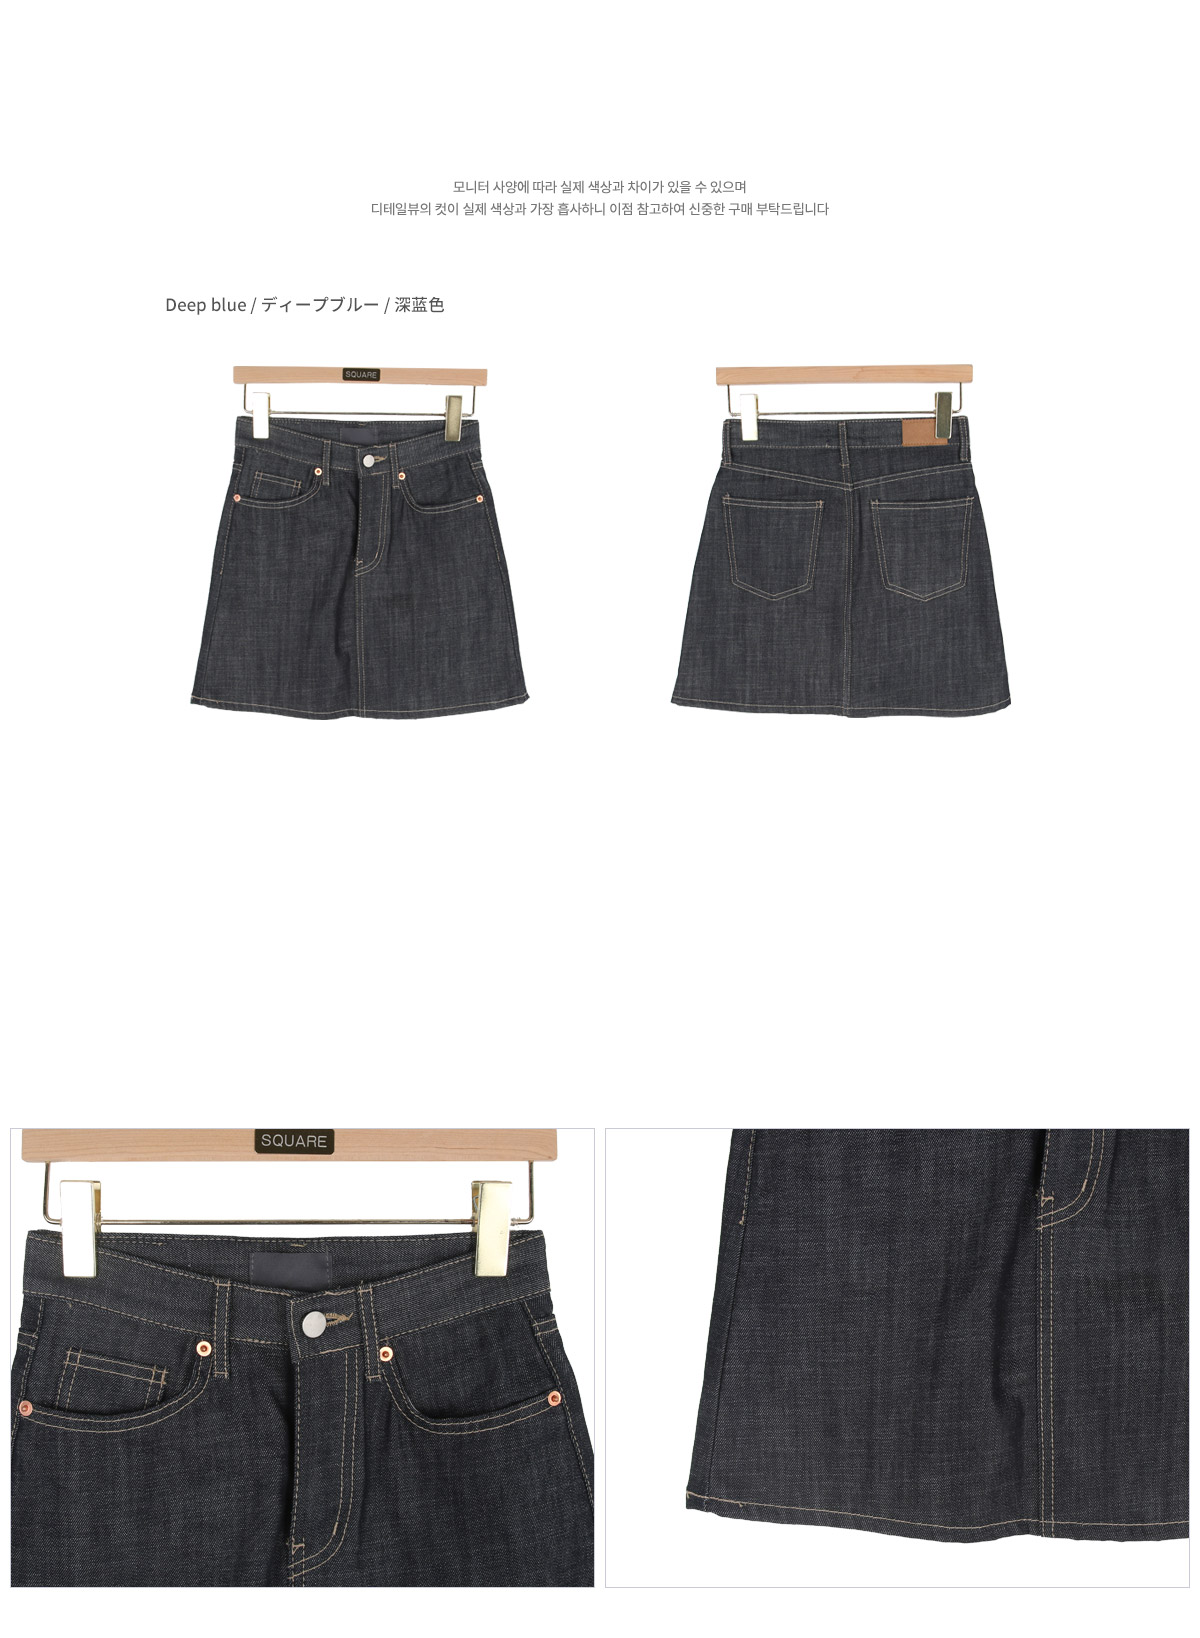 Low denim skirt